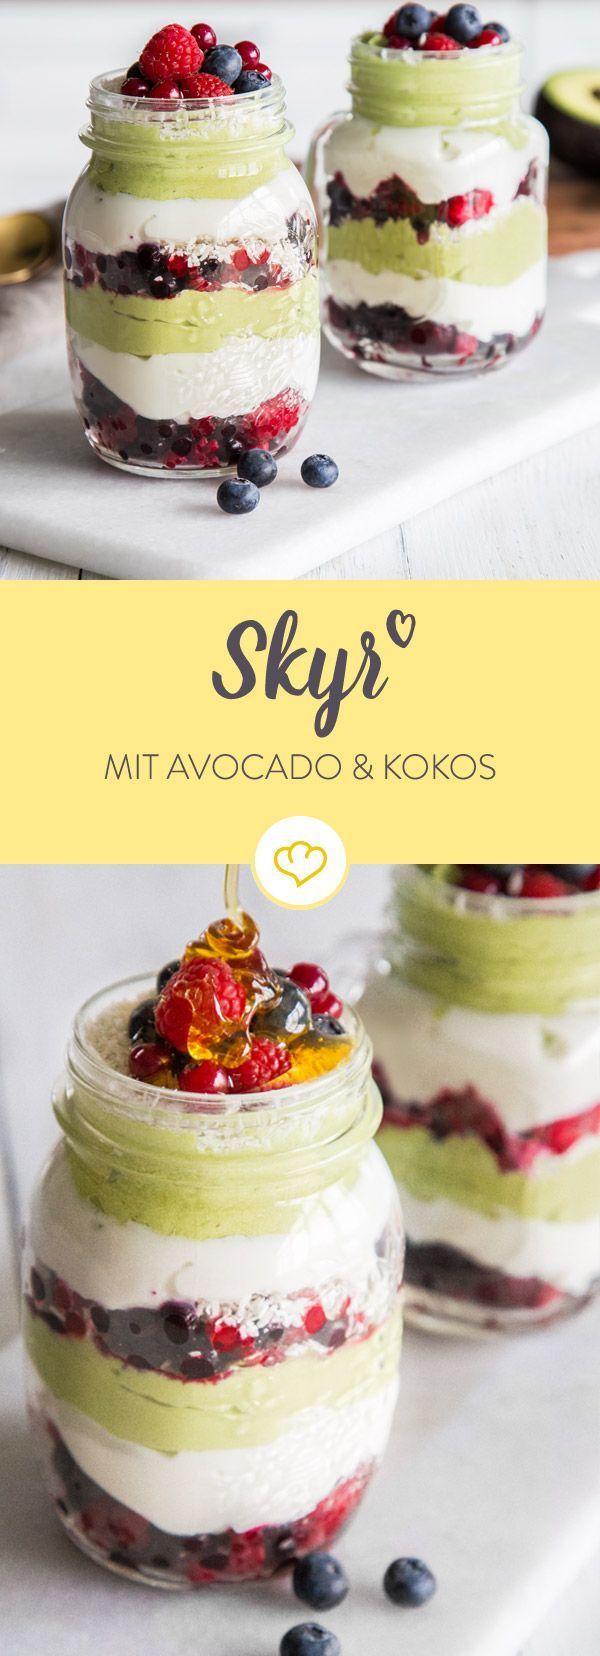 Fit in den Tag AvocadoKokosSkyr  LowCarb Rezepte  leicht  lecker